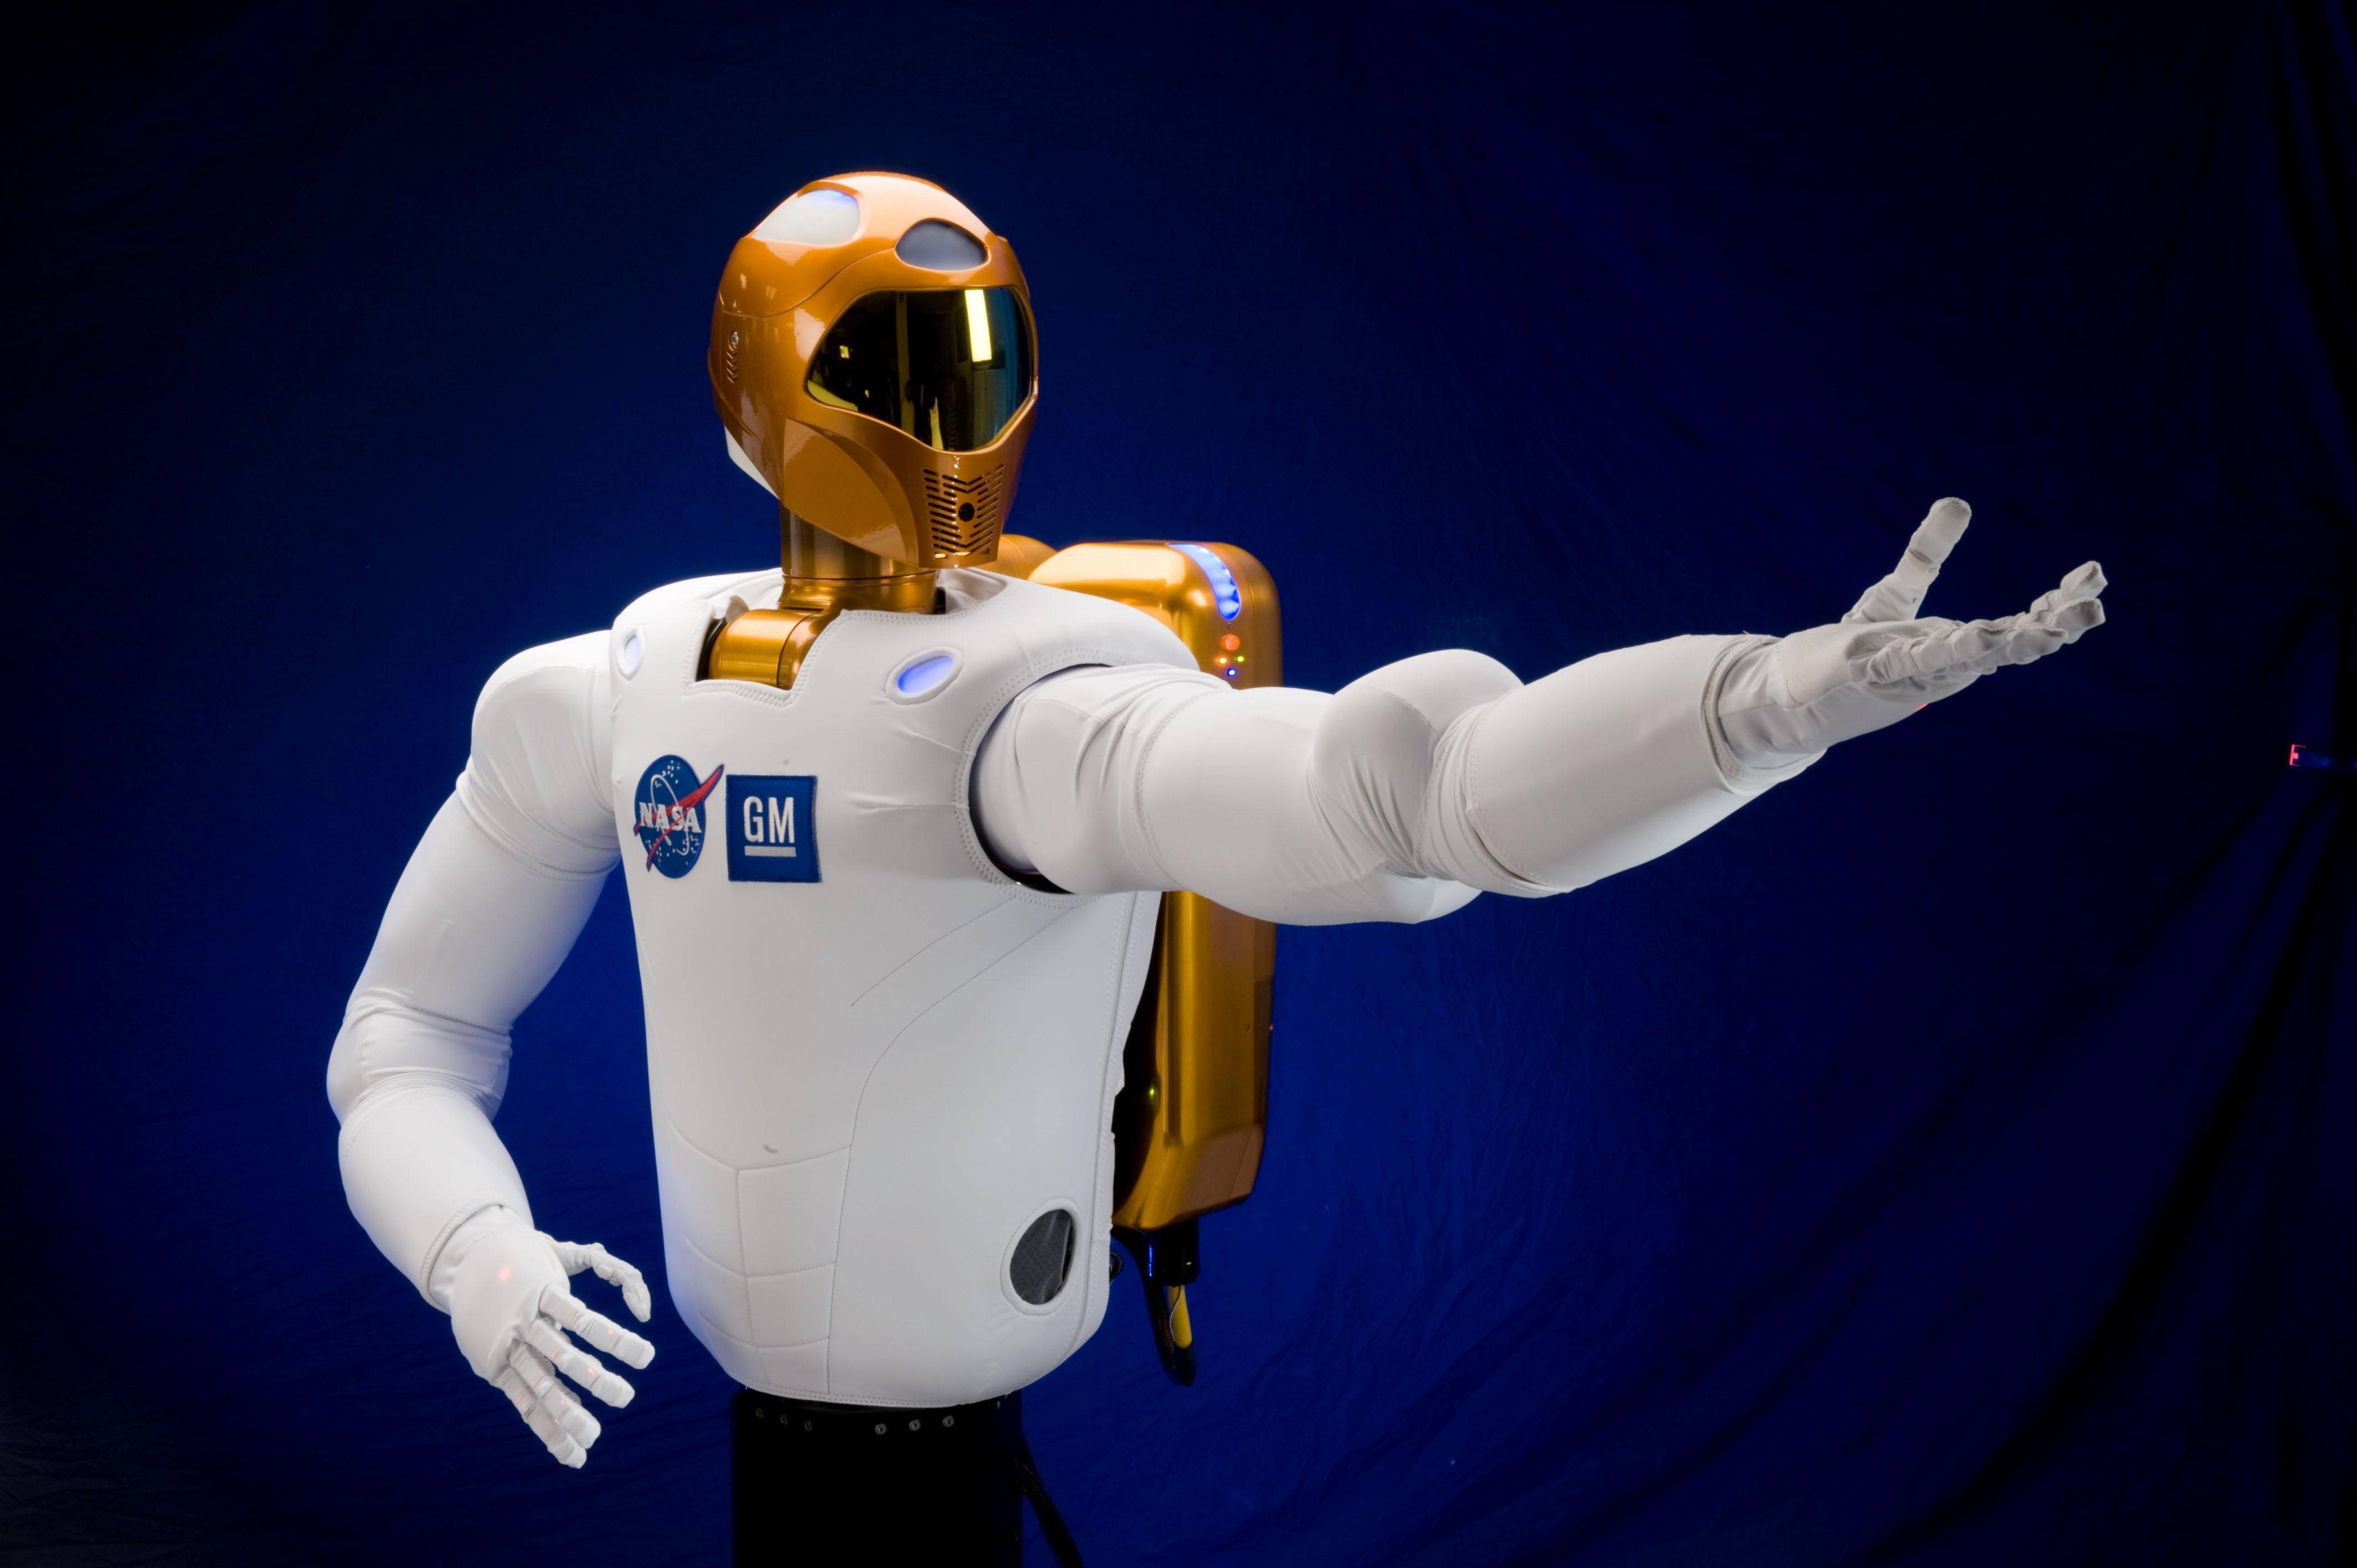 Move Over, R2-D2! NASA Already Has Plenty of Robots in Space